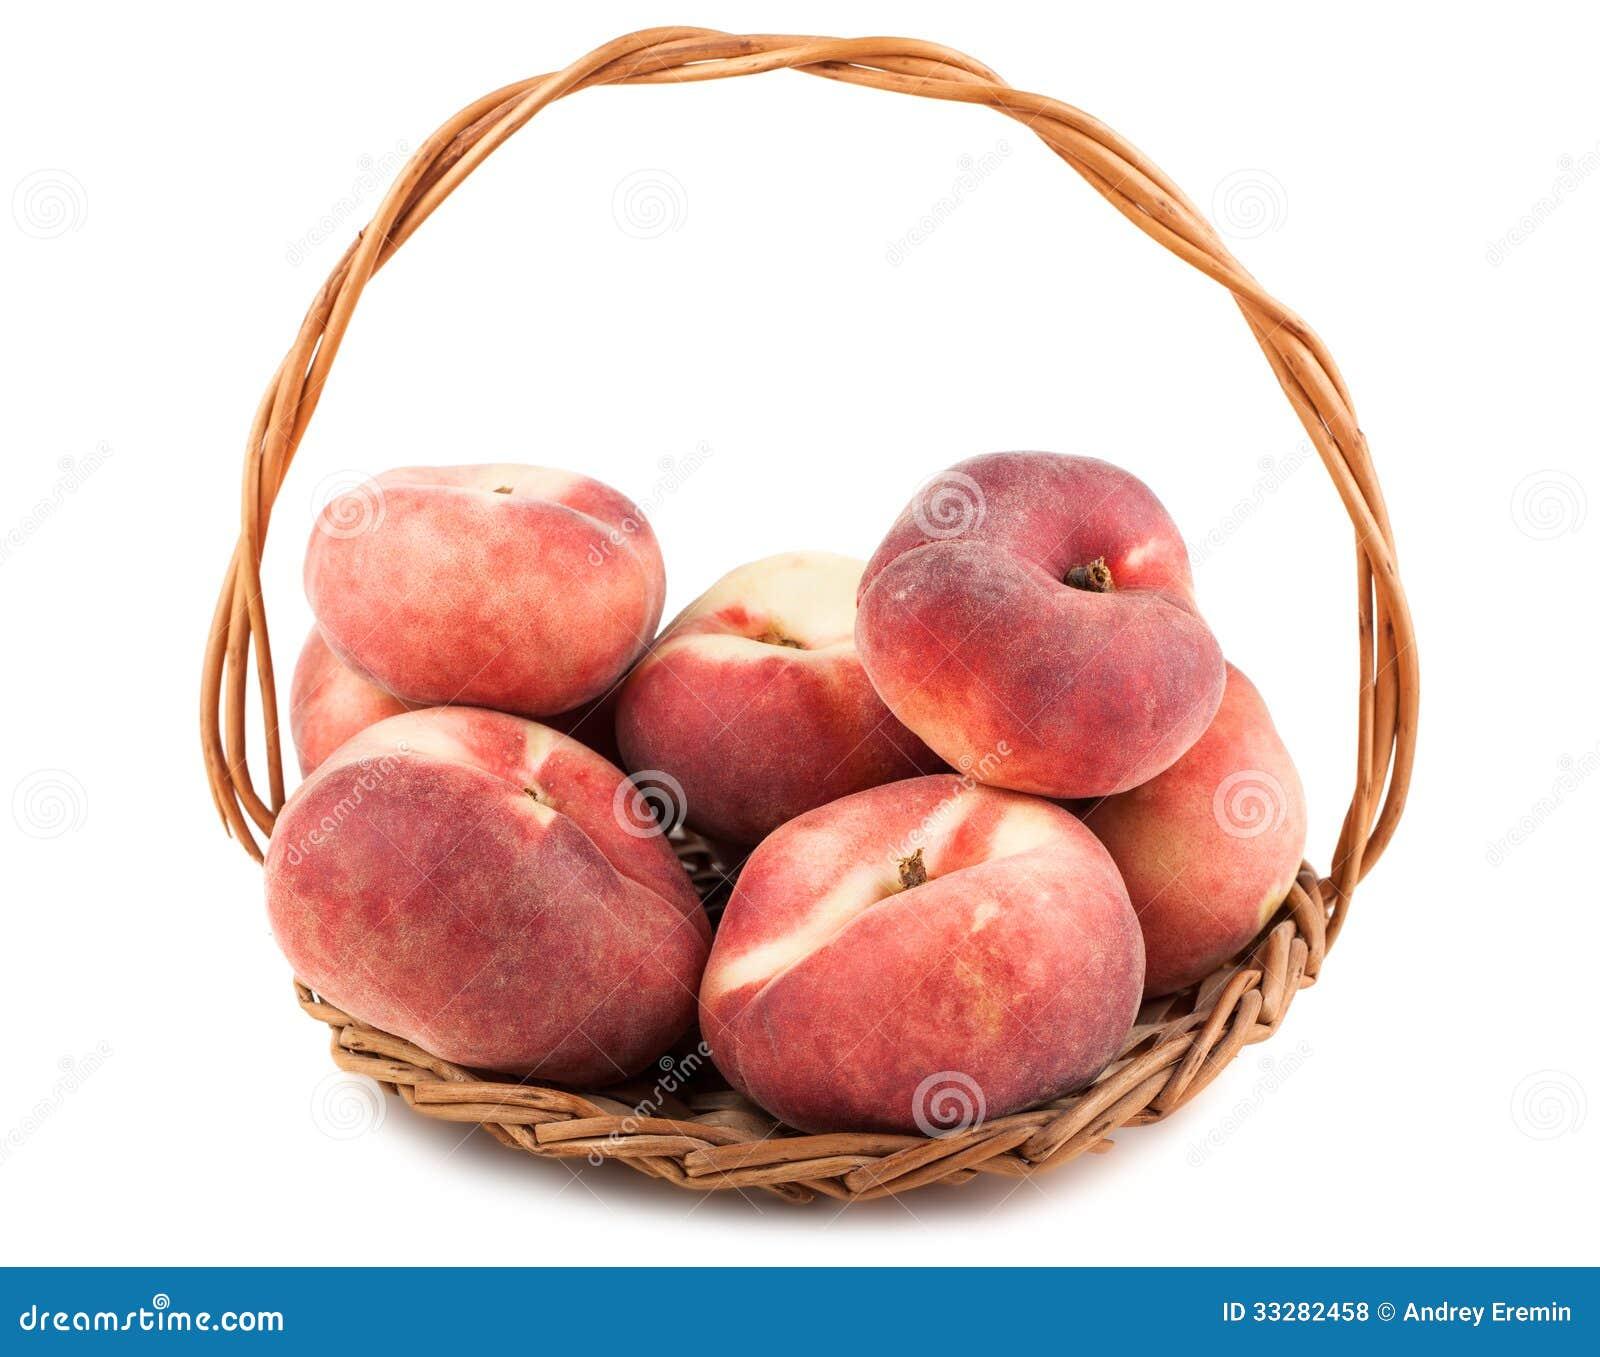 asian flat baskets